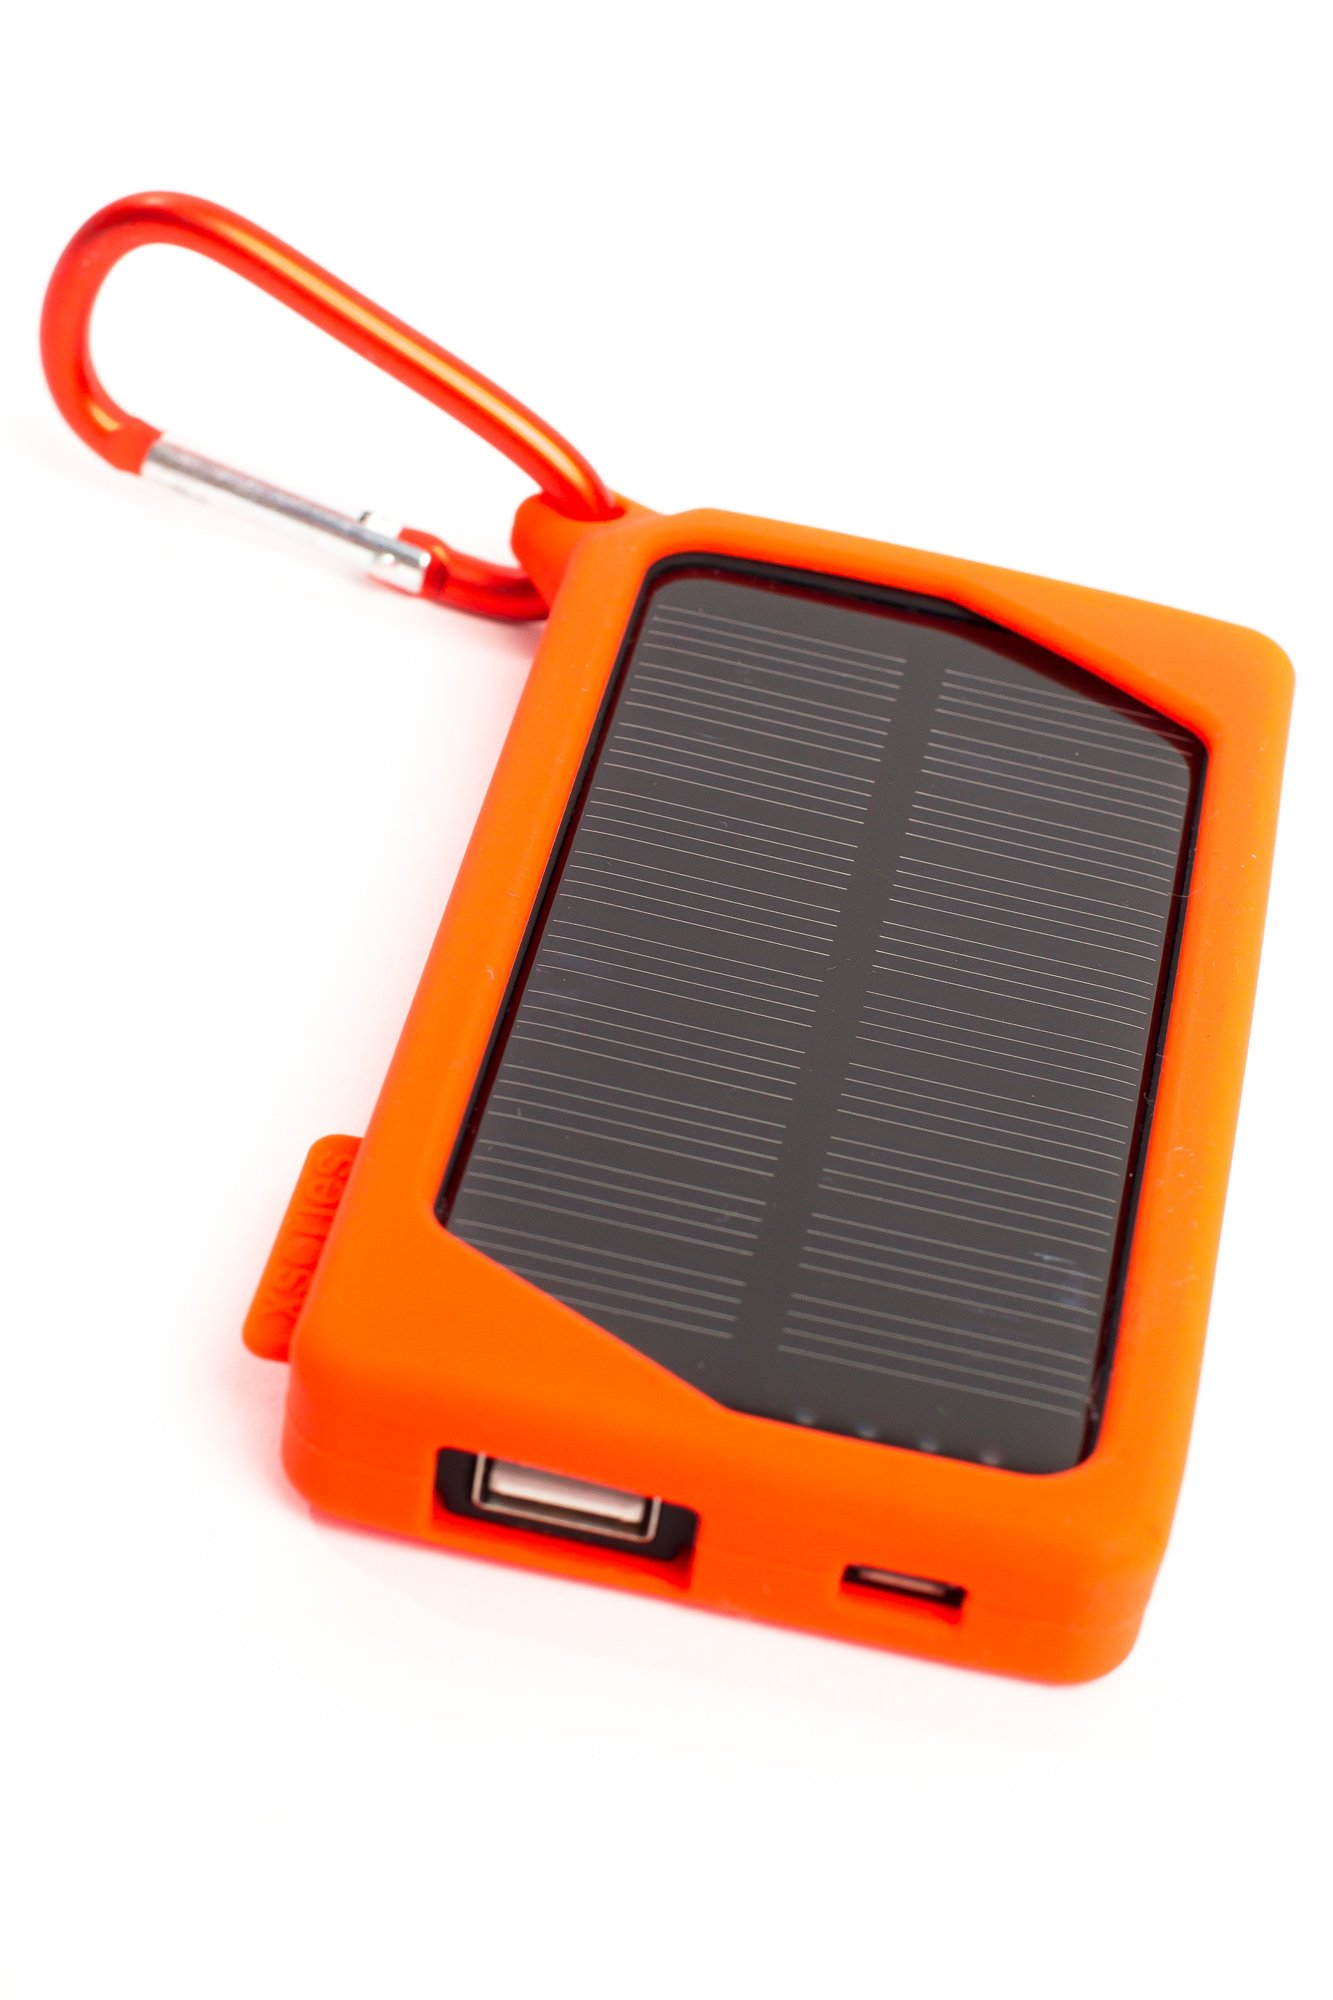 XSOLAR 2000mAh Solar Portable Battery Charger Compact Power Bank Smartphone iPhone iPad Samsung Galaxy